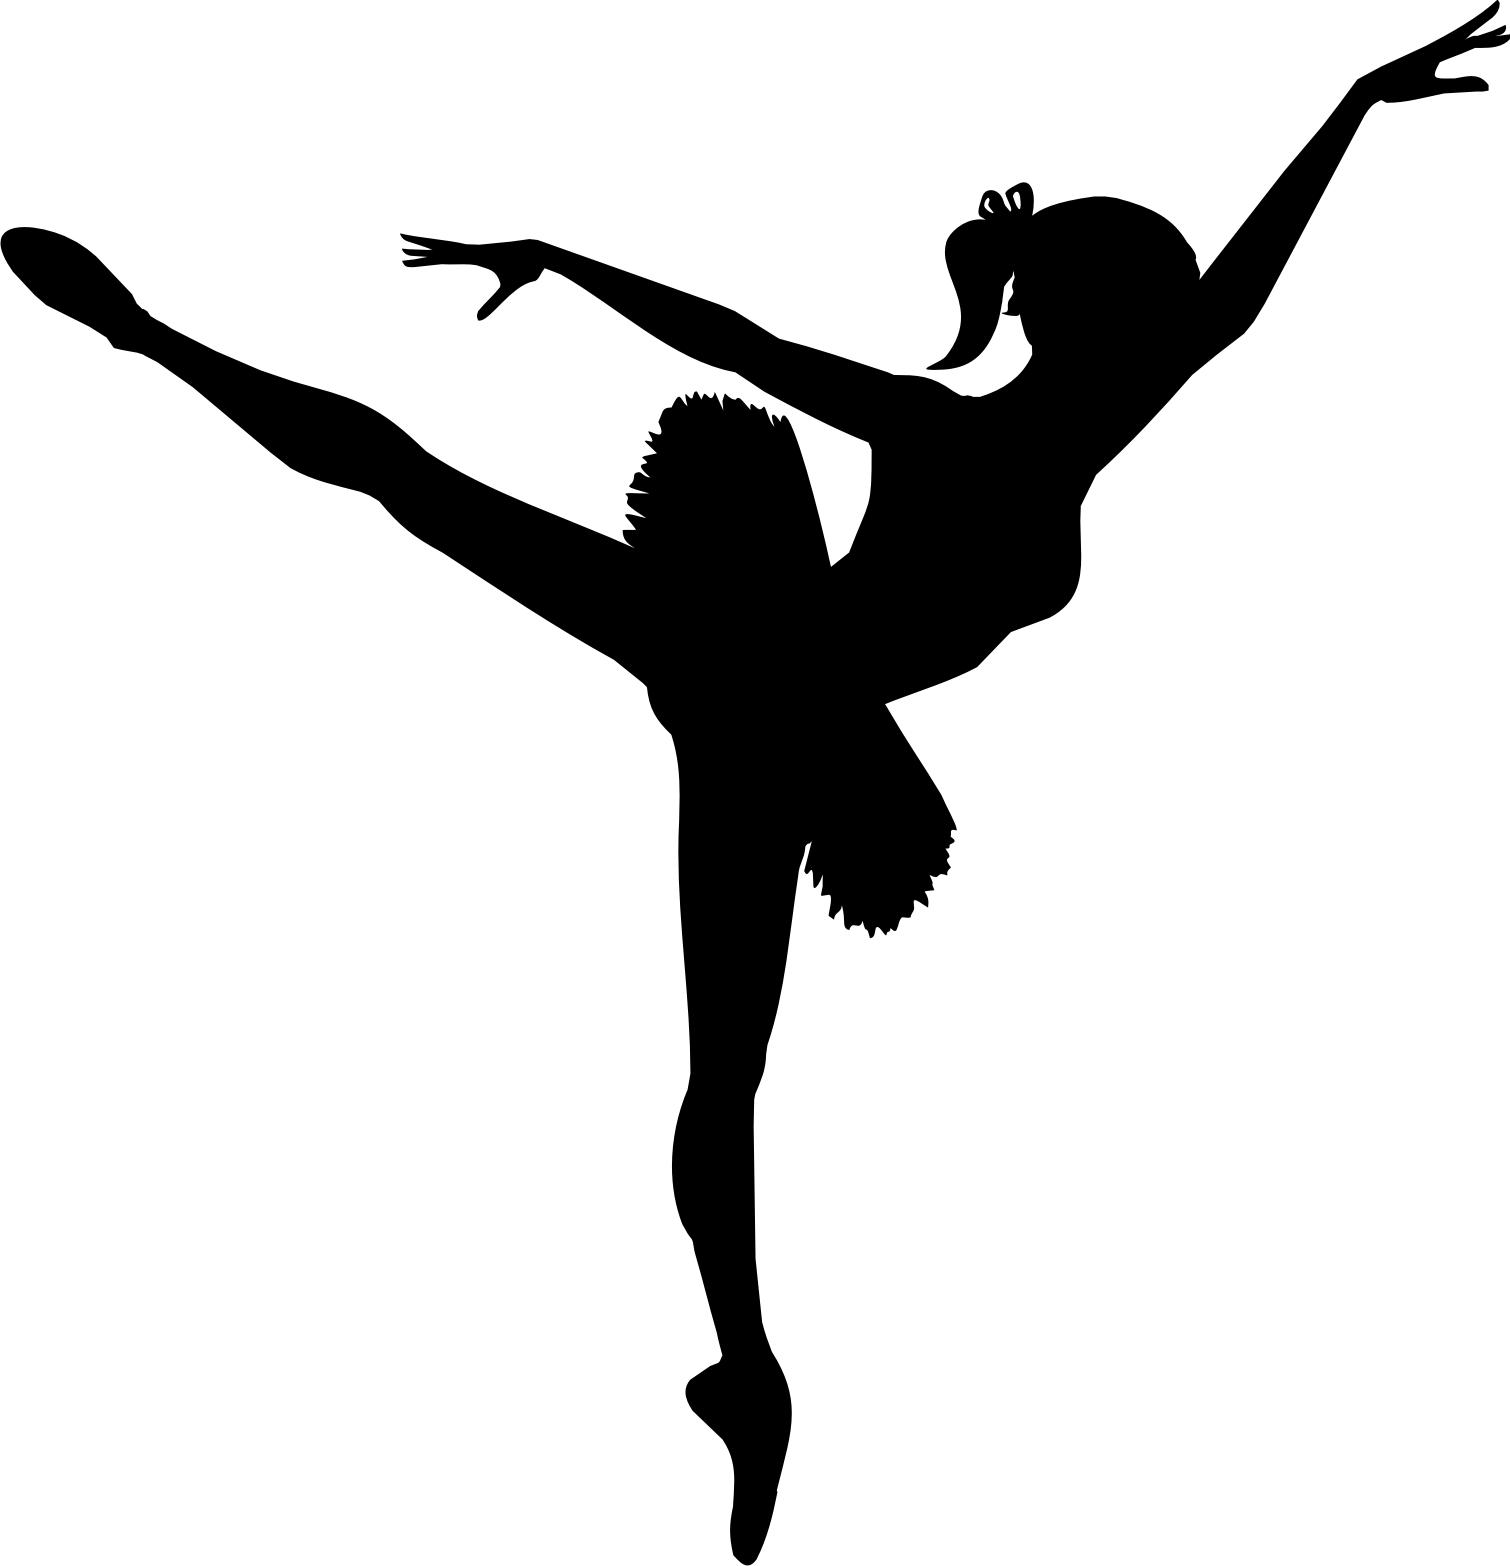 картинка балерина черно белая картинка объективе несколько